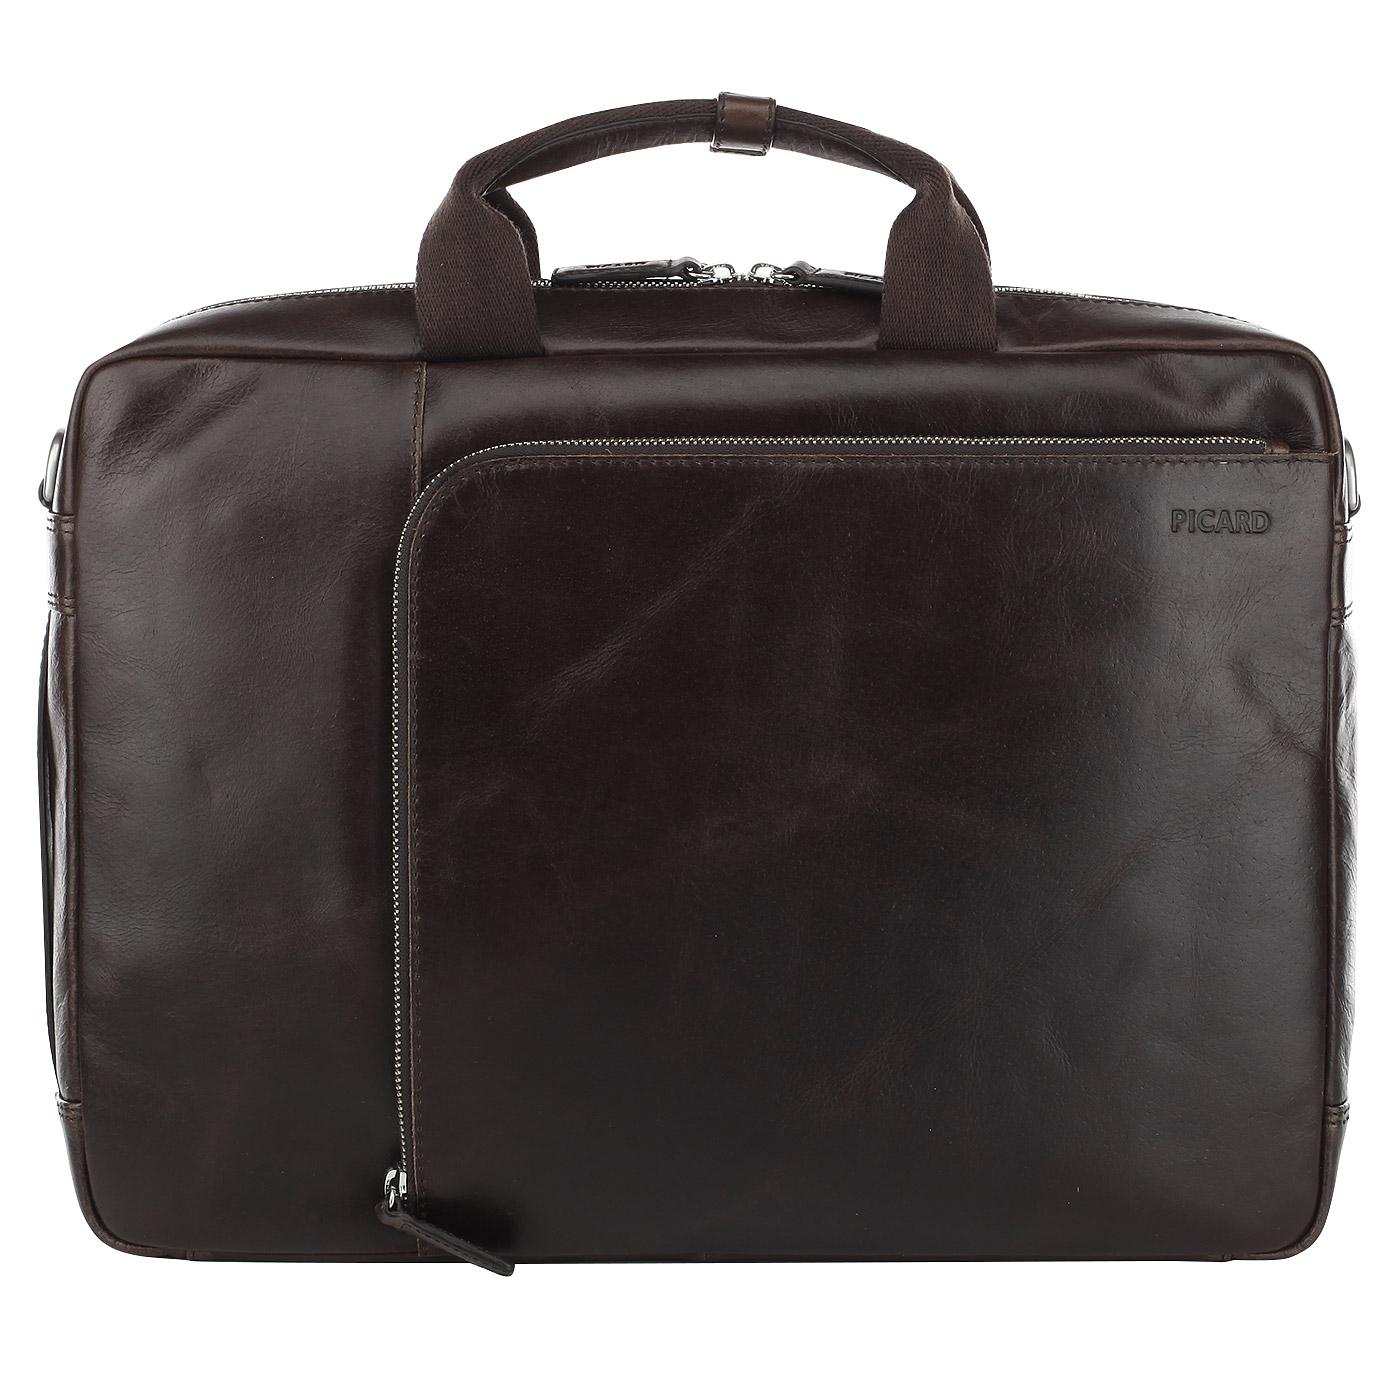 ade147fb89cd Кожаная мужская сумка-рюкзак Picard Buddy 4505 51B_cafe ...